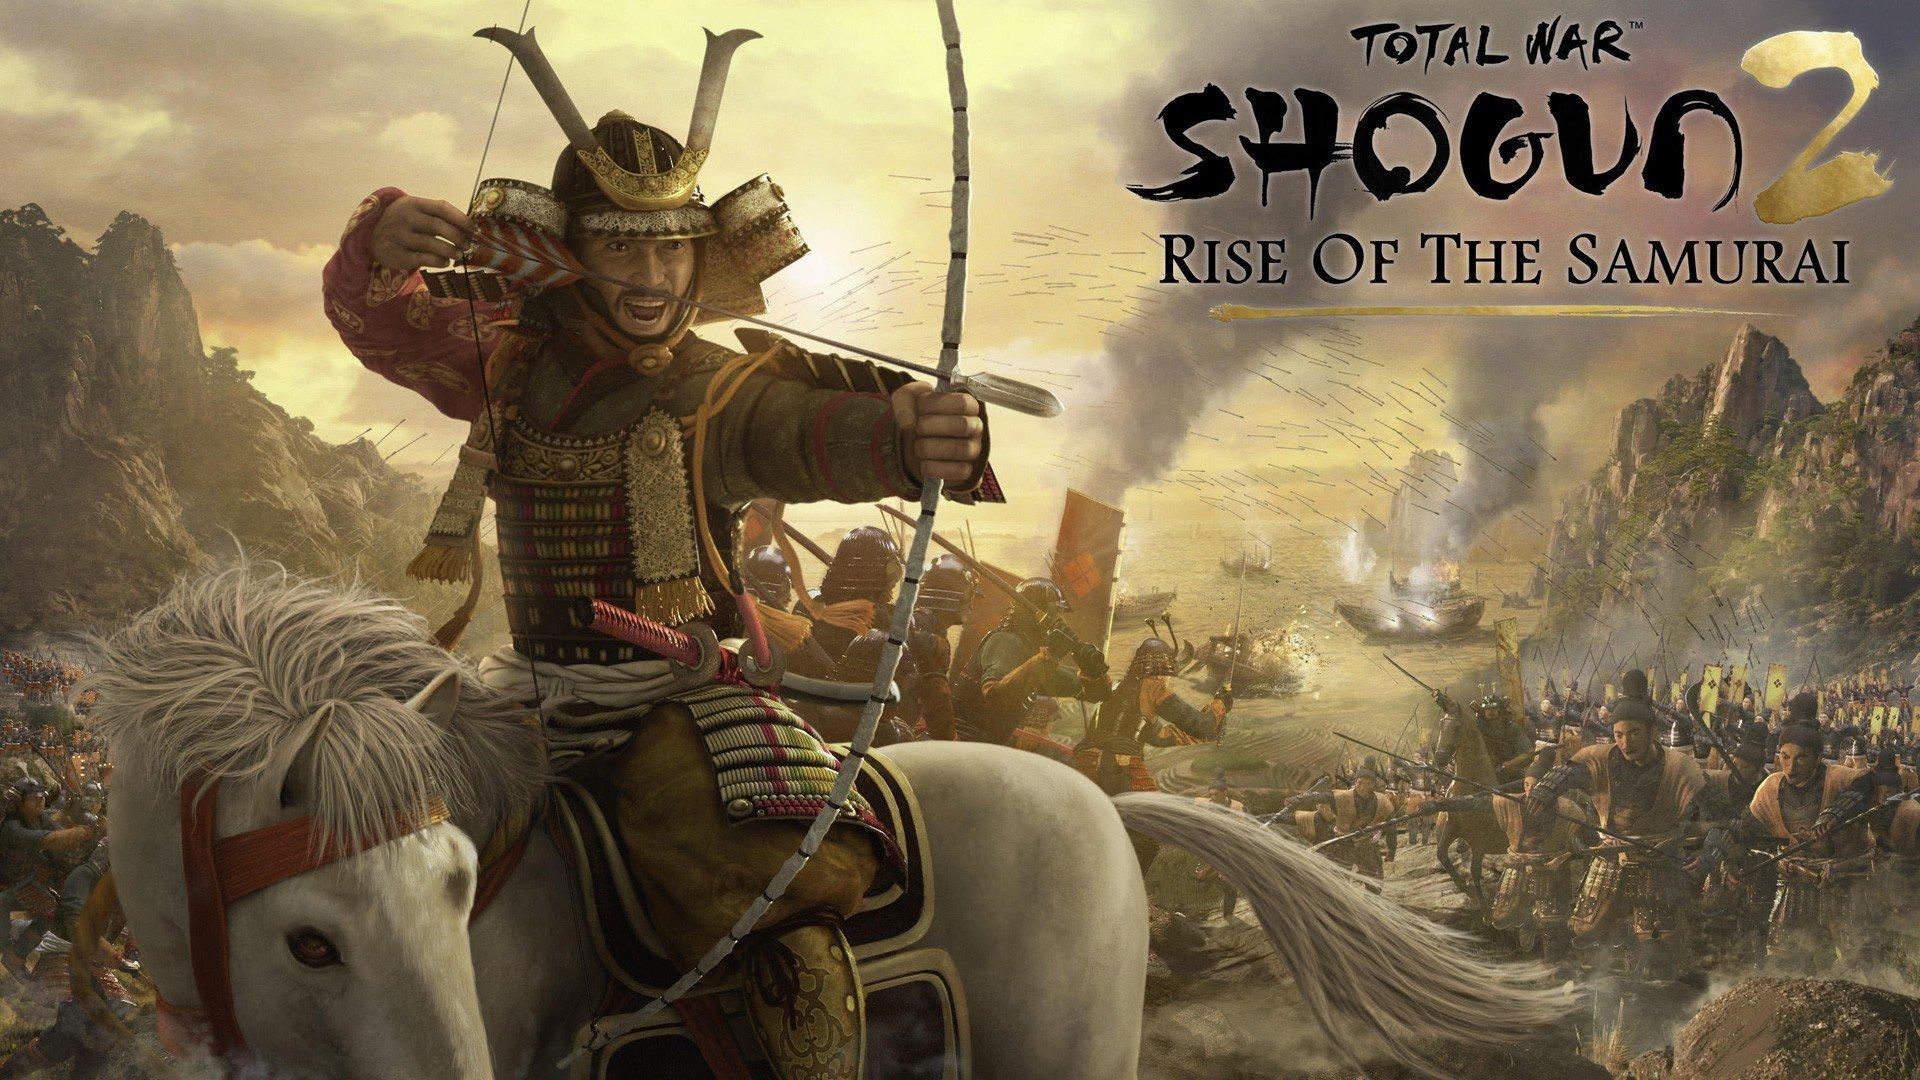 Total War Shogun 2 Hd Wallpapers Desktop And Mobile Images Photos